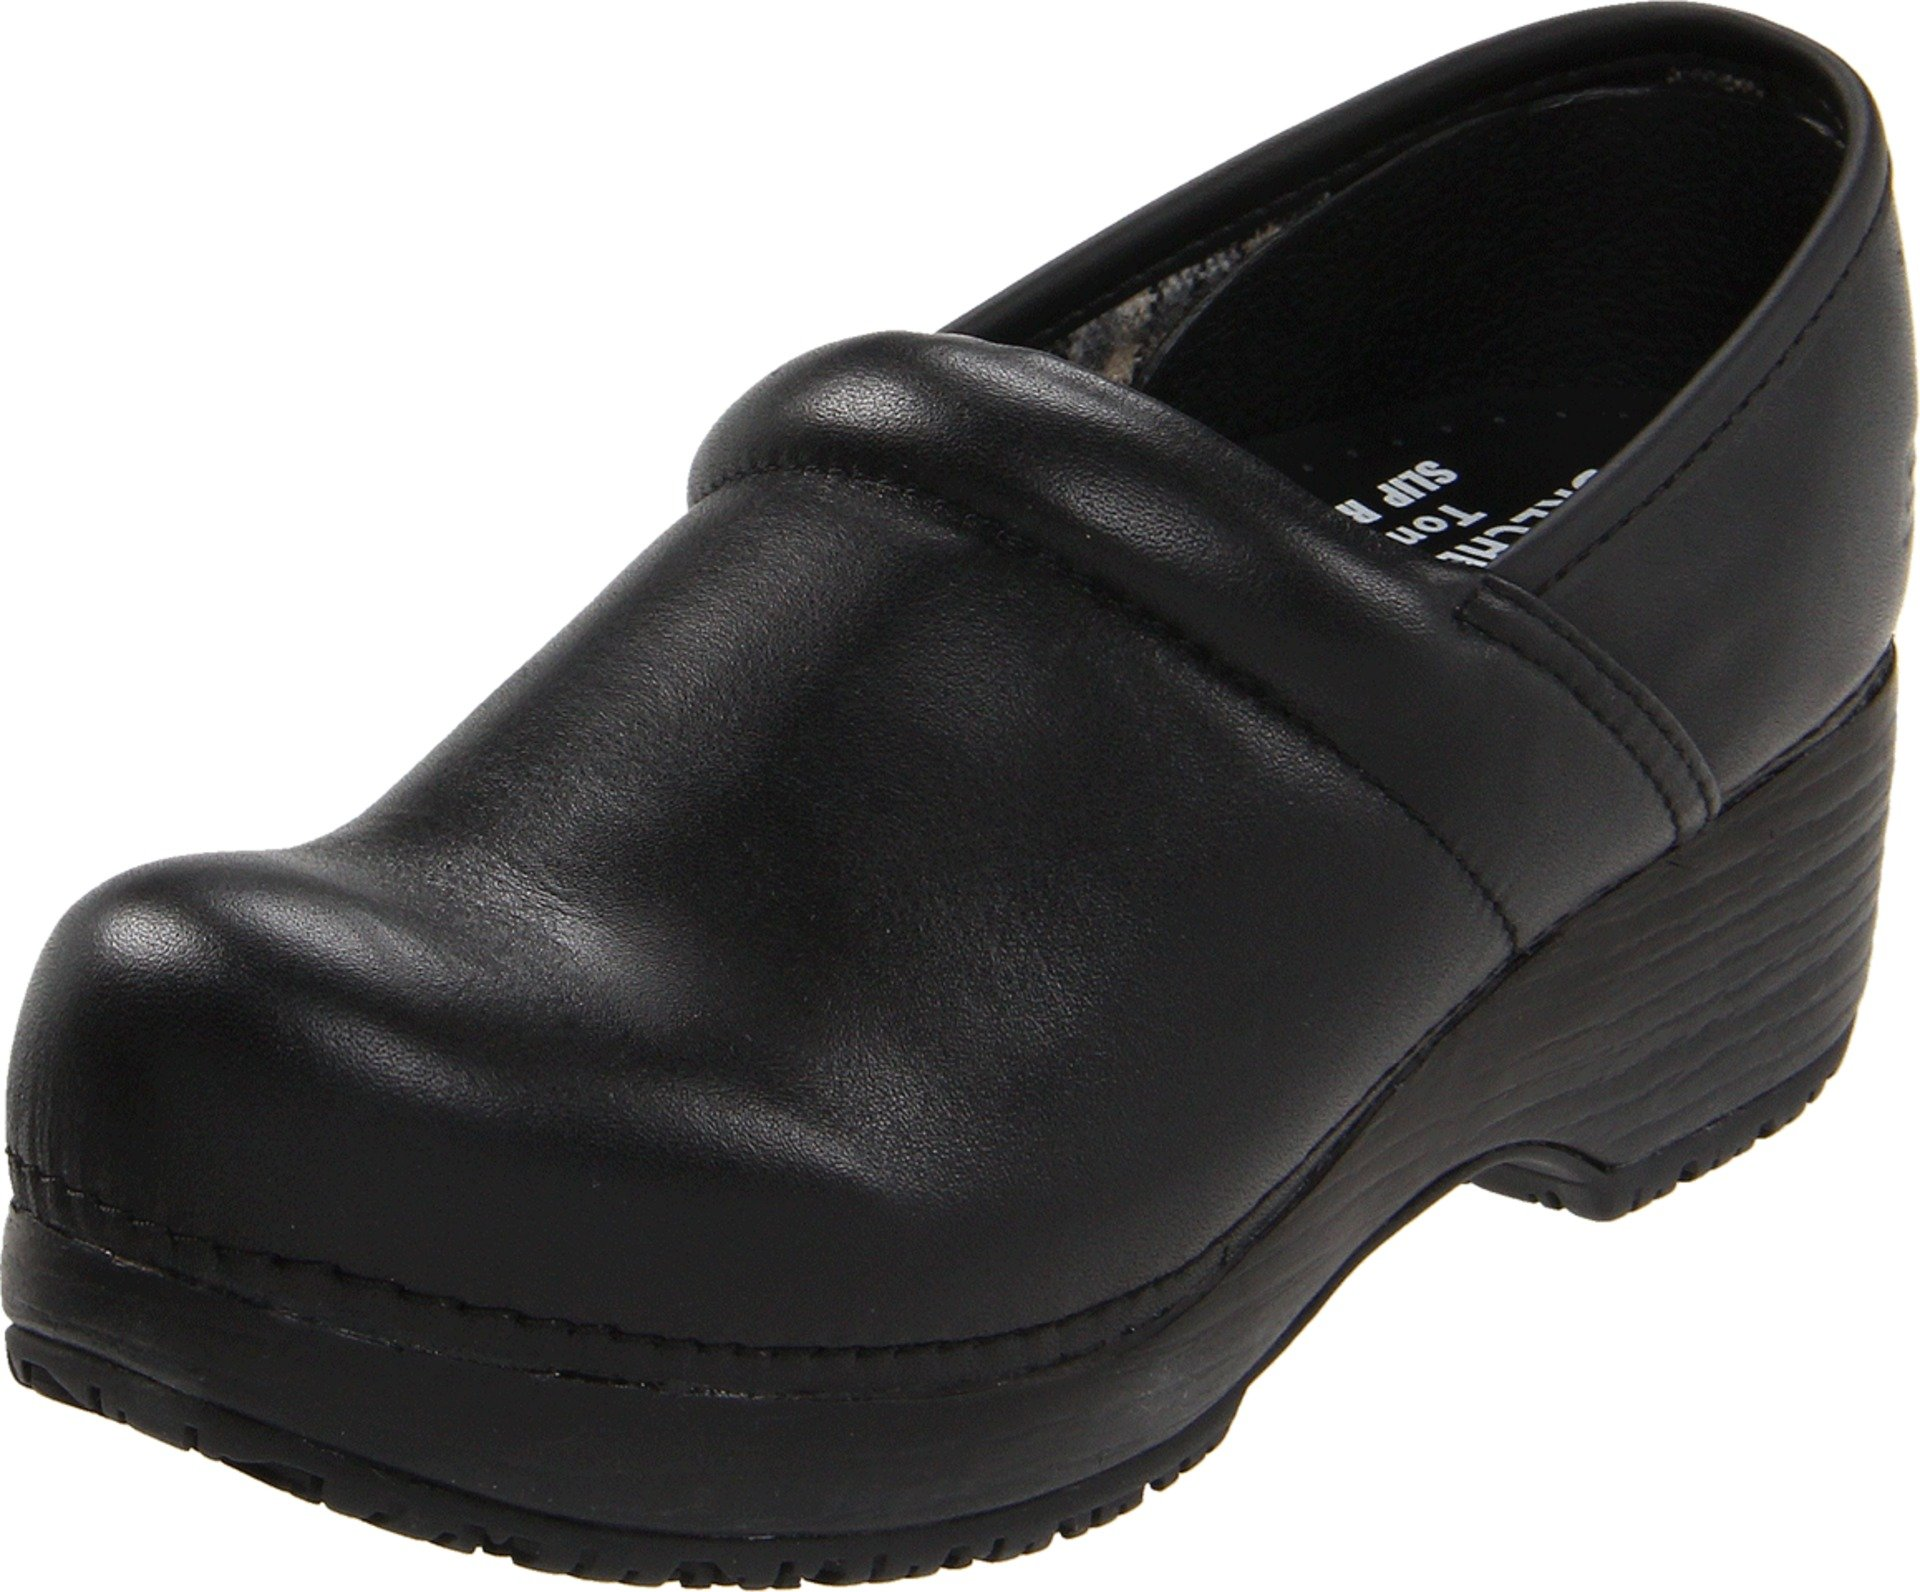 Skechers for Work Women's Clog, Black, 8 M US by Skechers